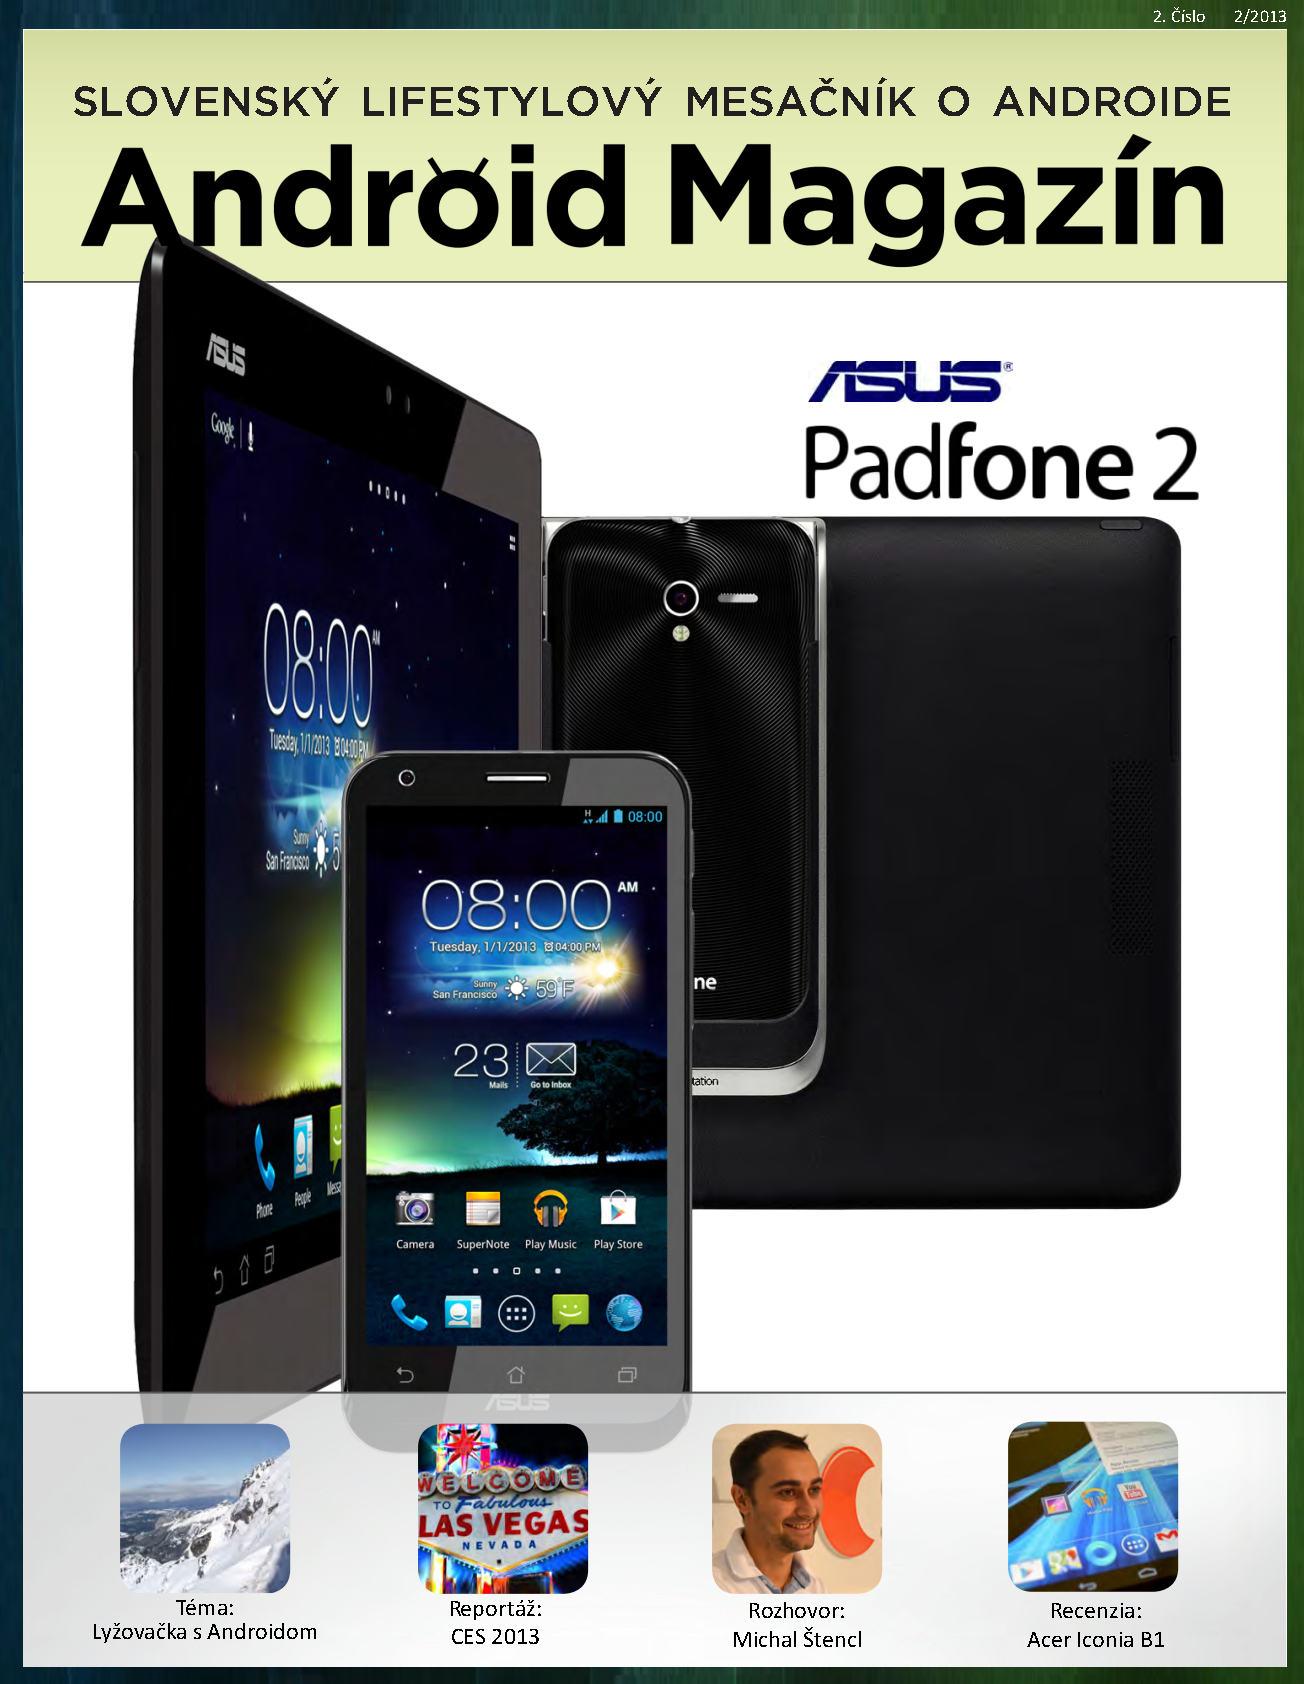 AndroidMagazin 02 2013